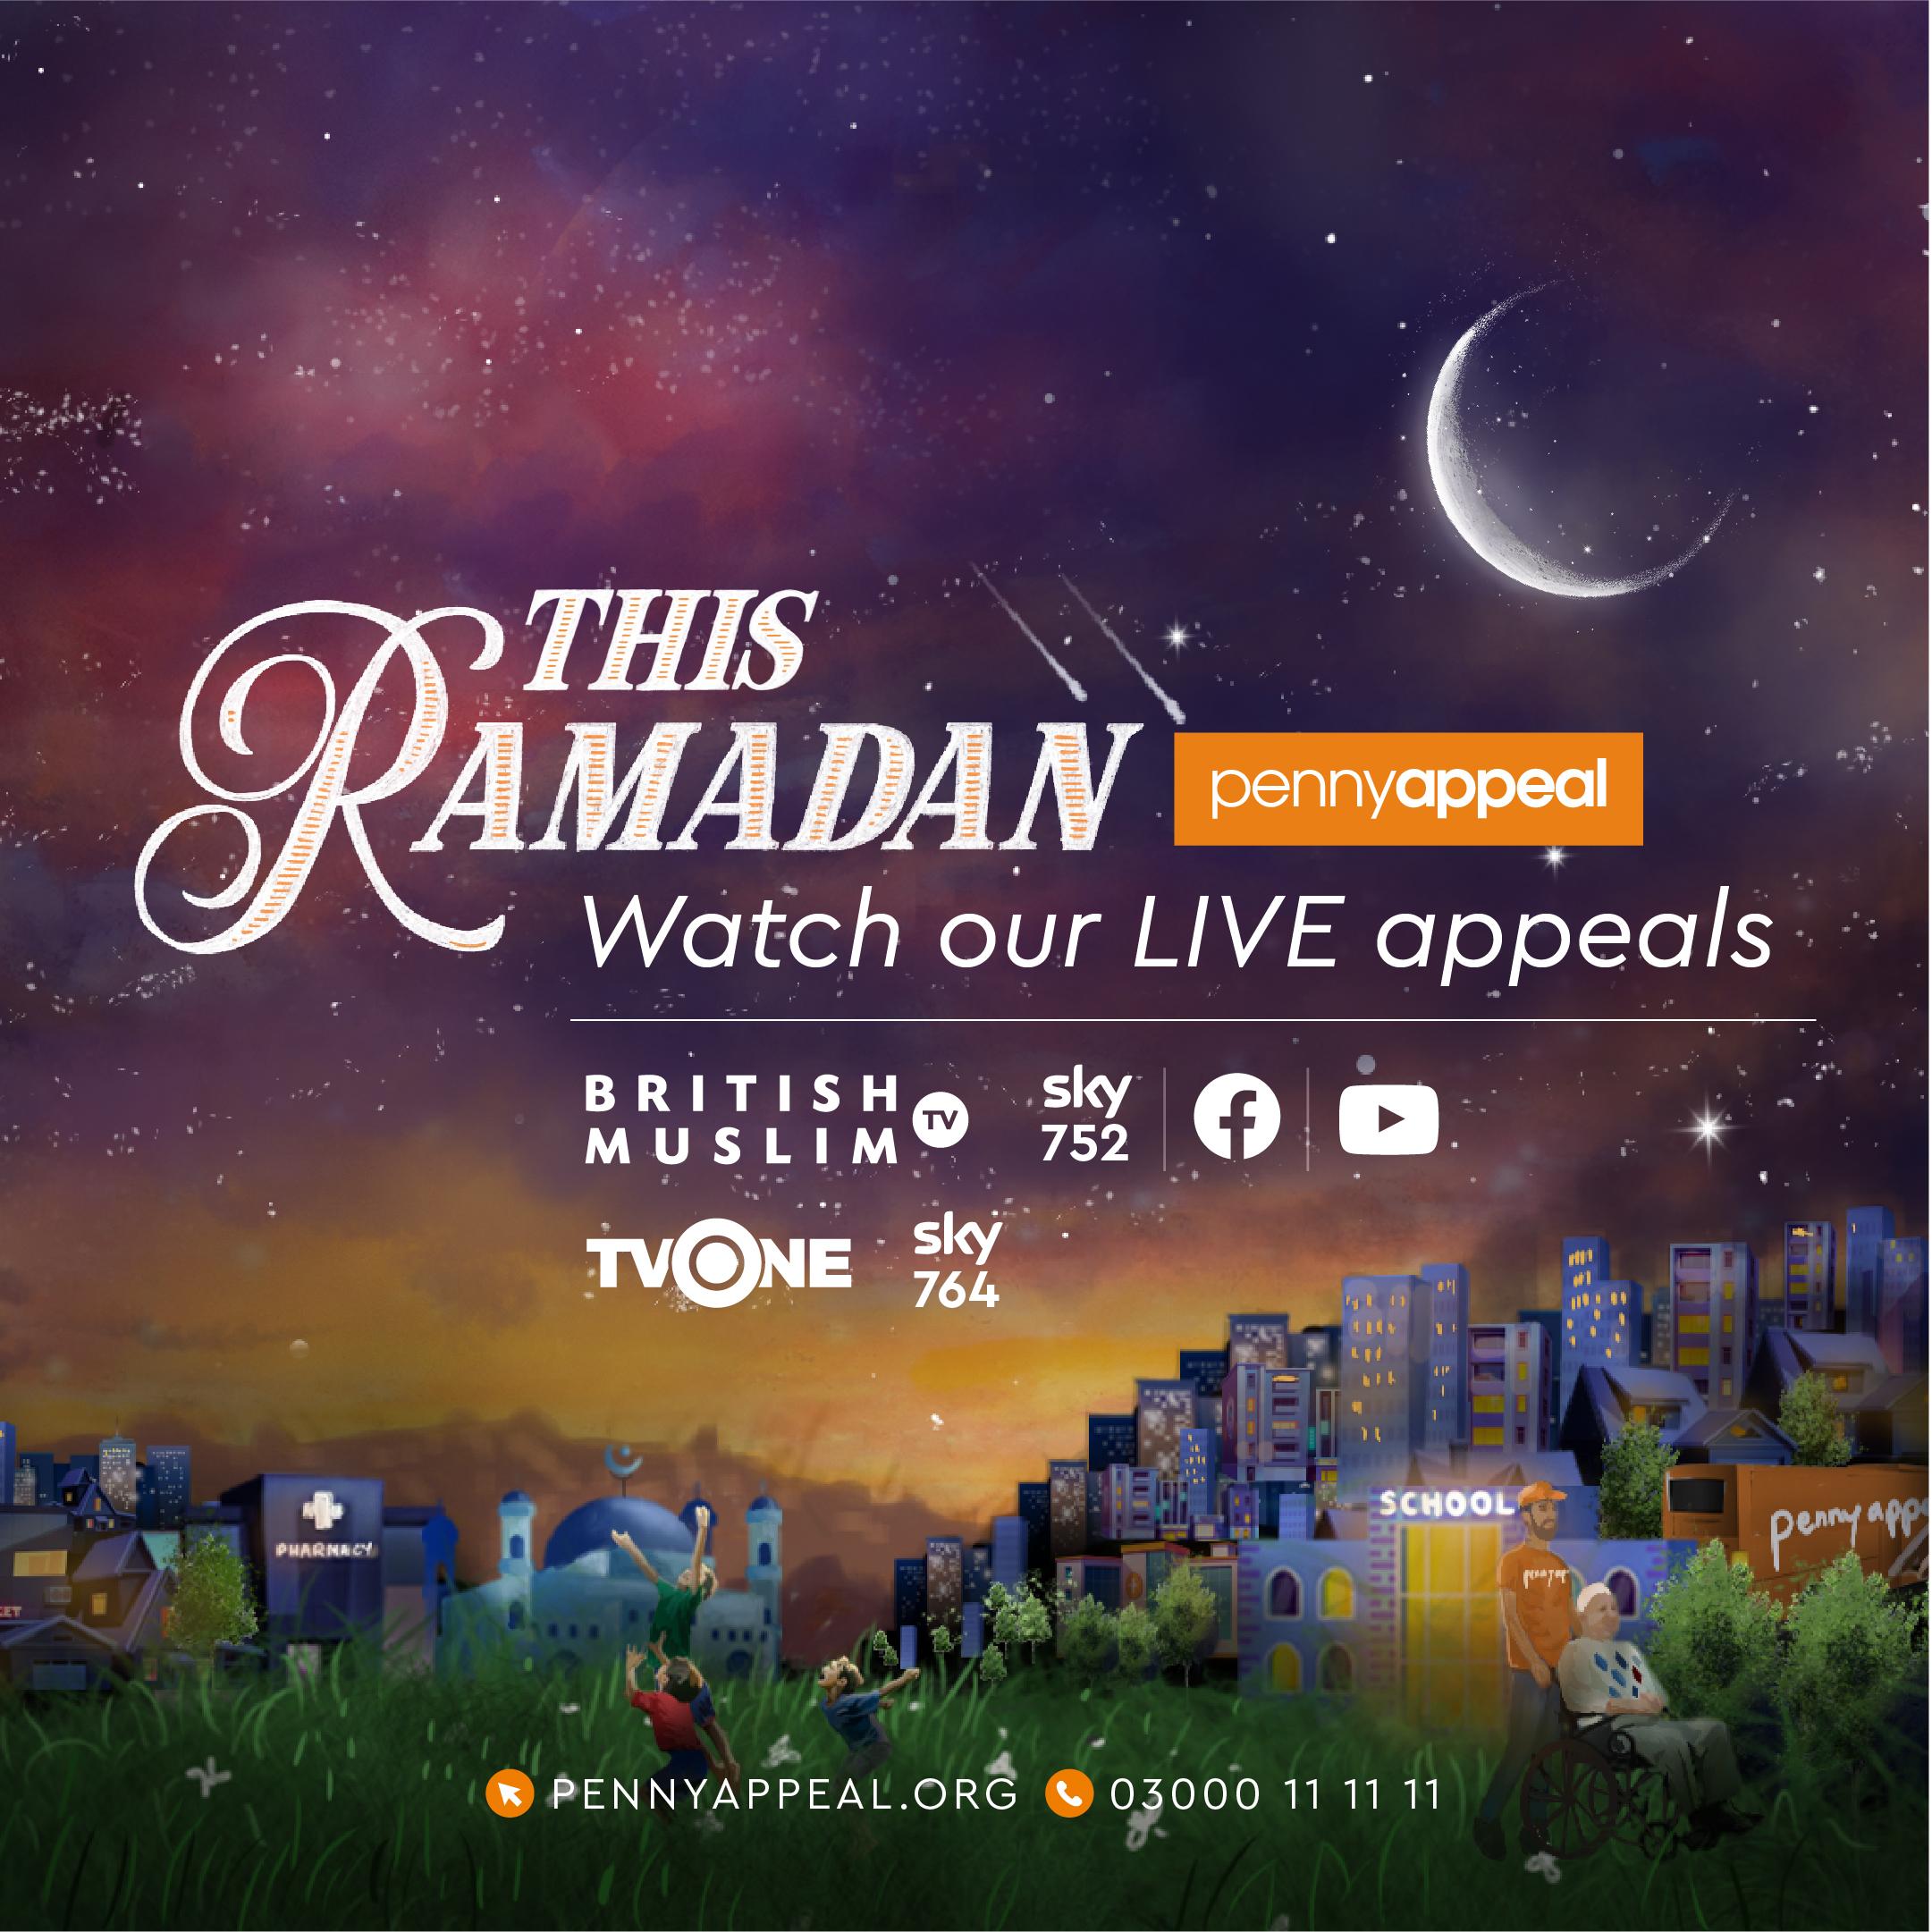 Muslim Islamic Charity | PennyAppeal org